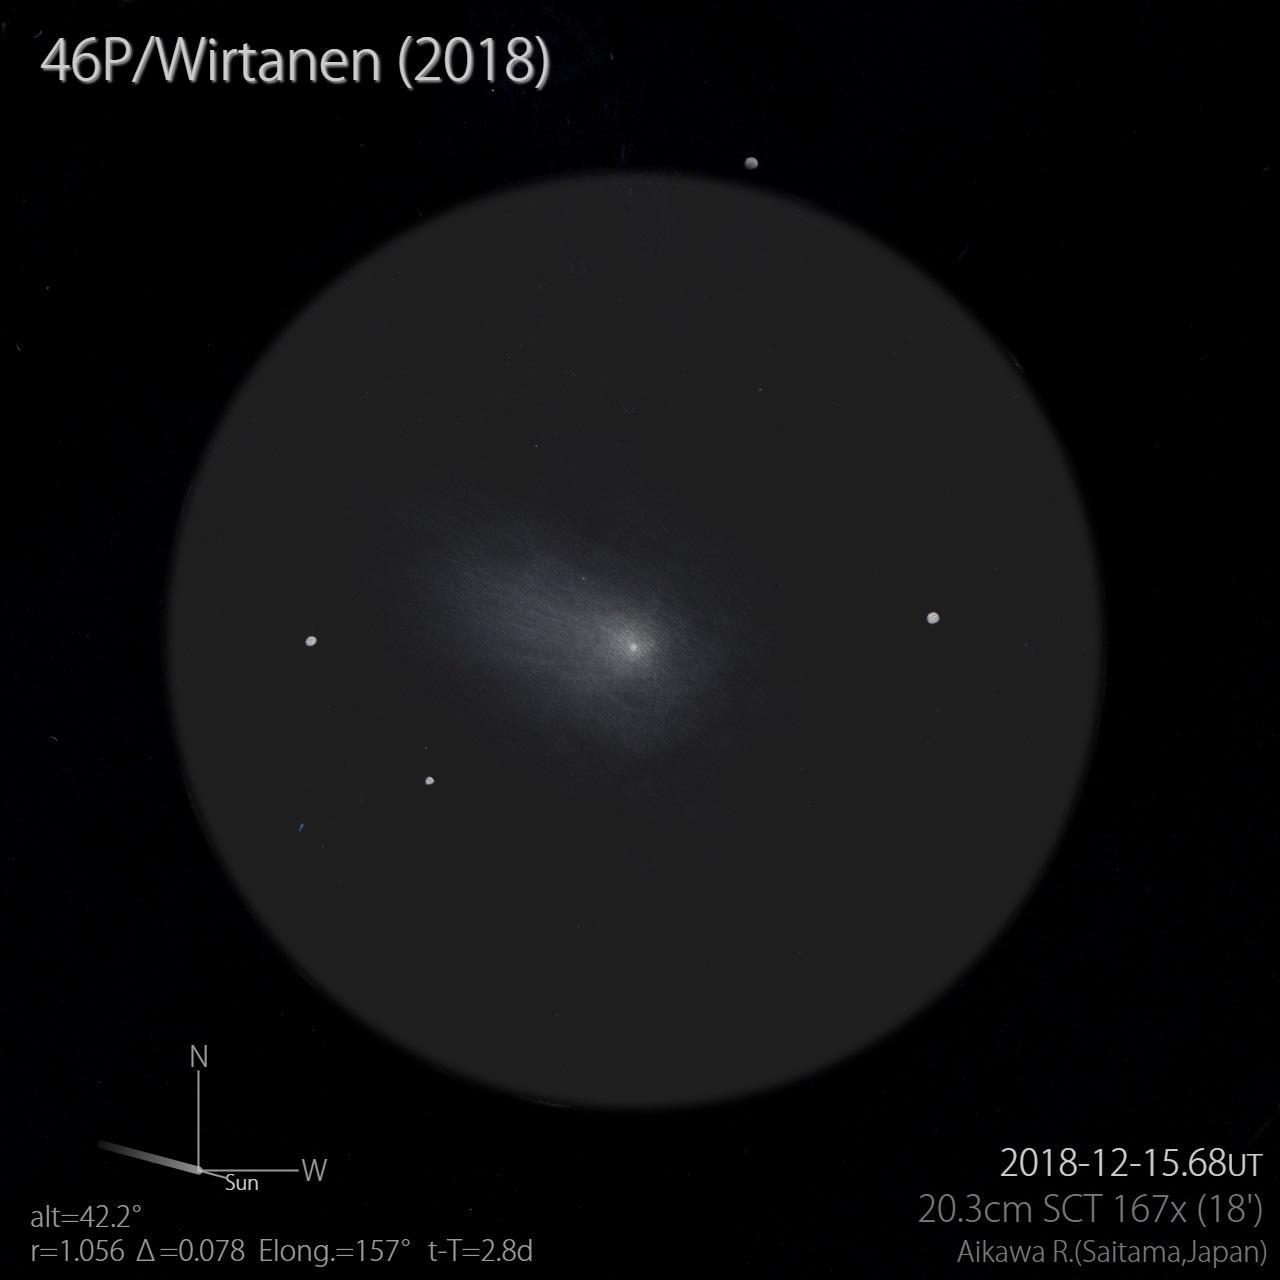 0046P-2018_009-editPosi-30-0.9.jpg